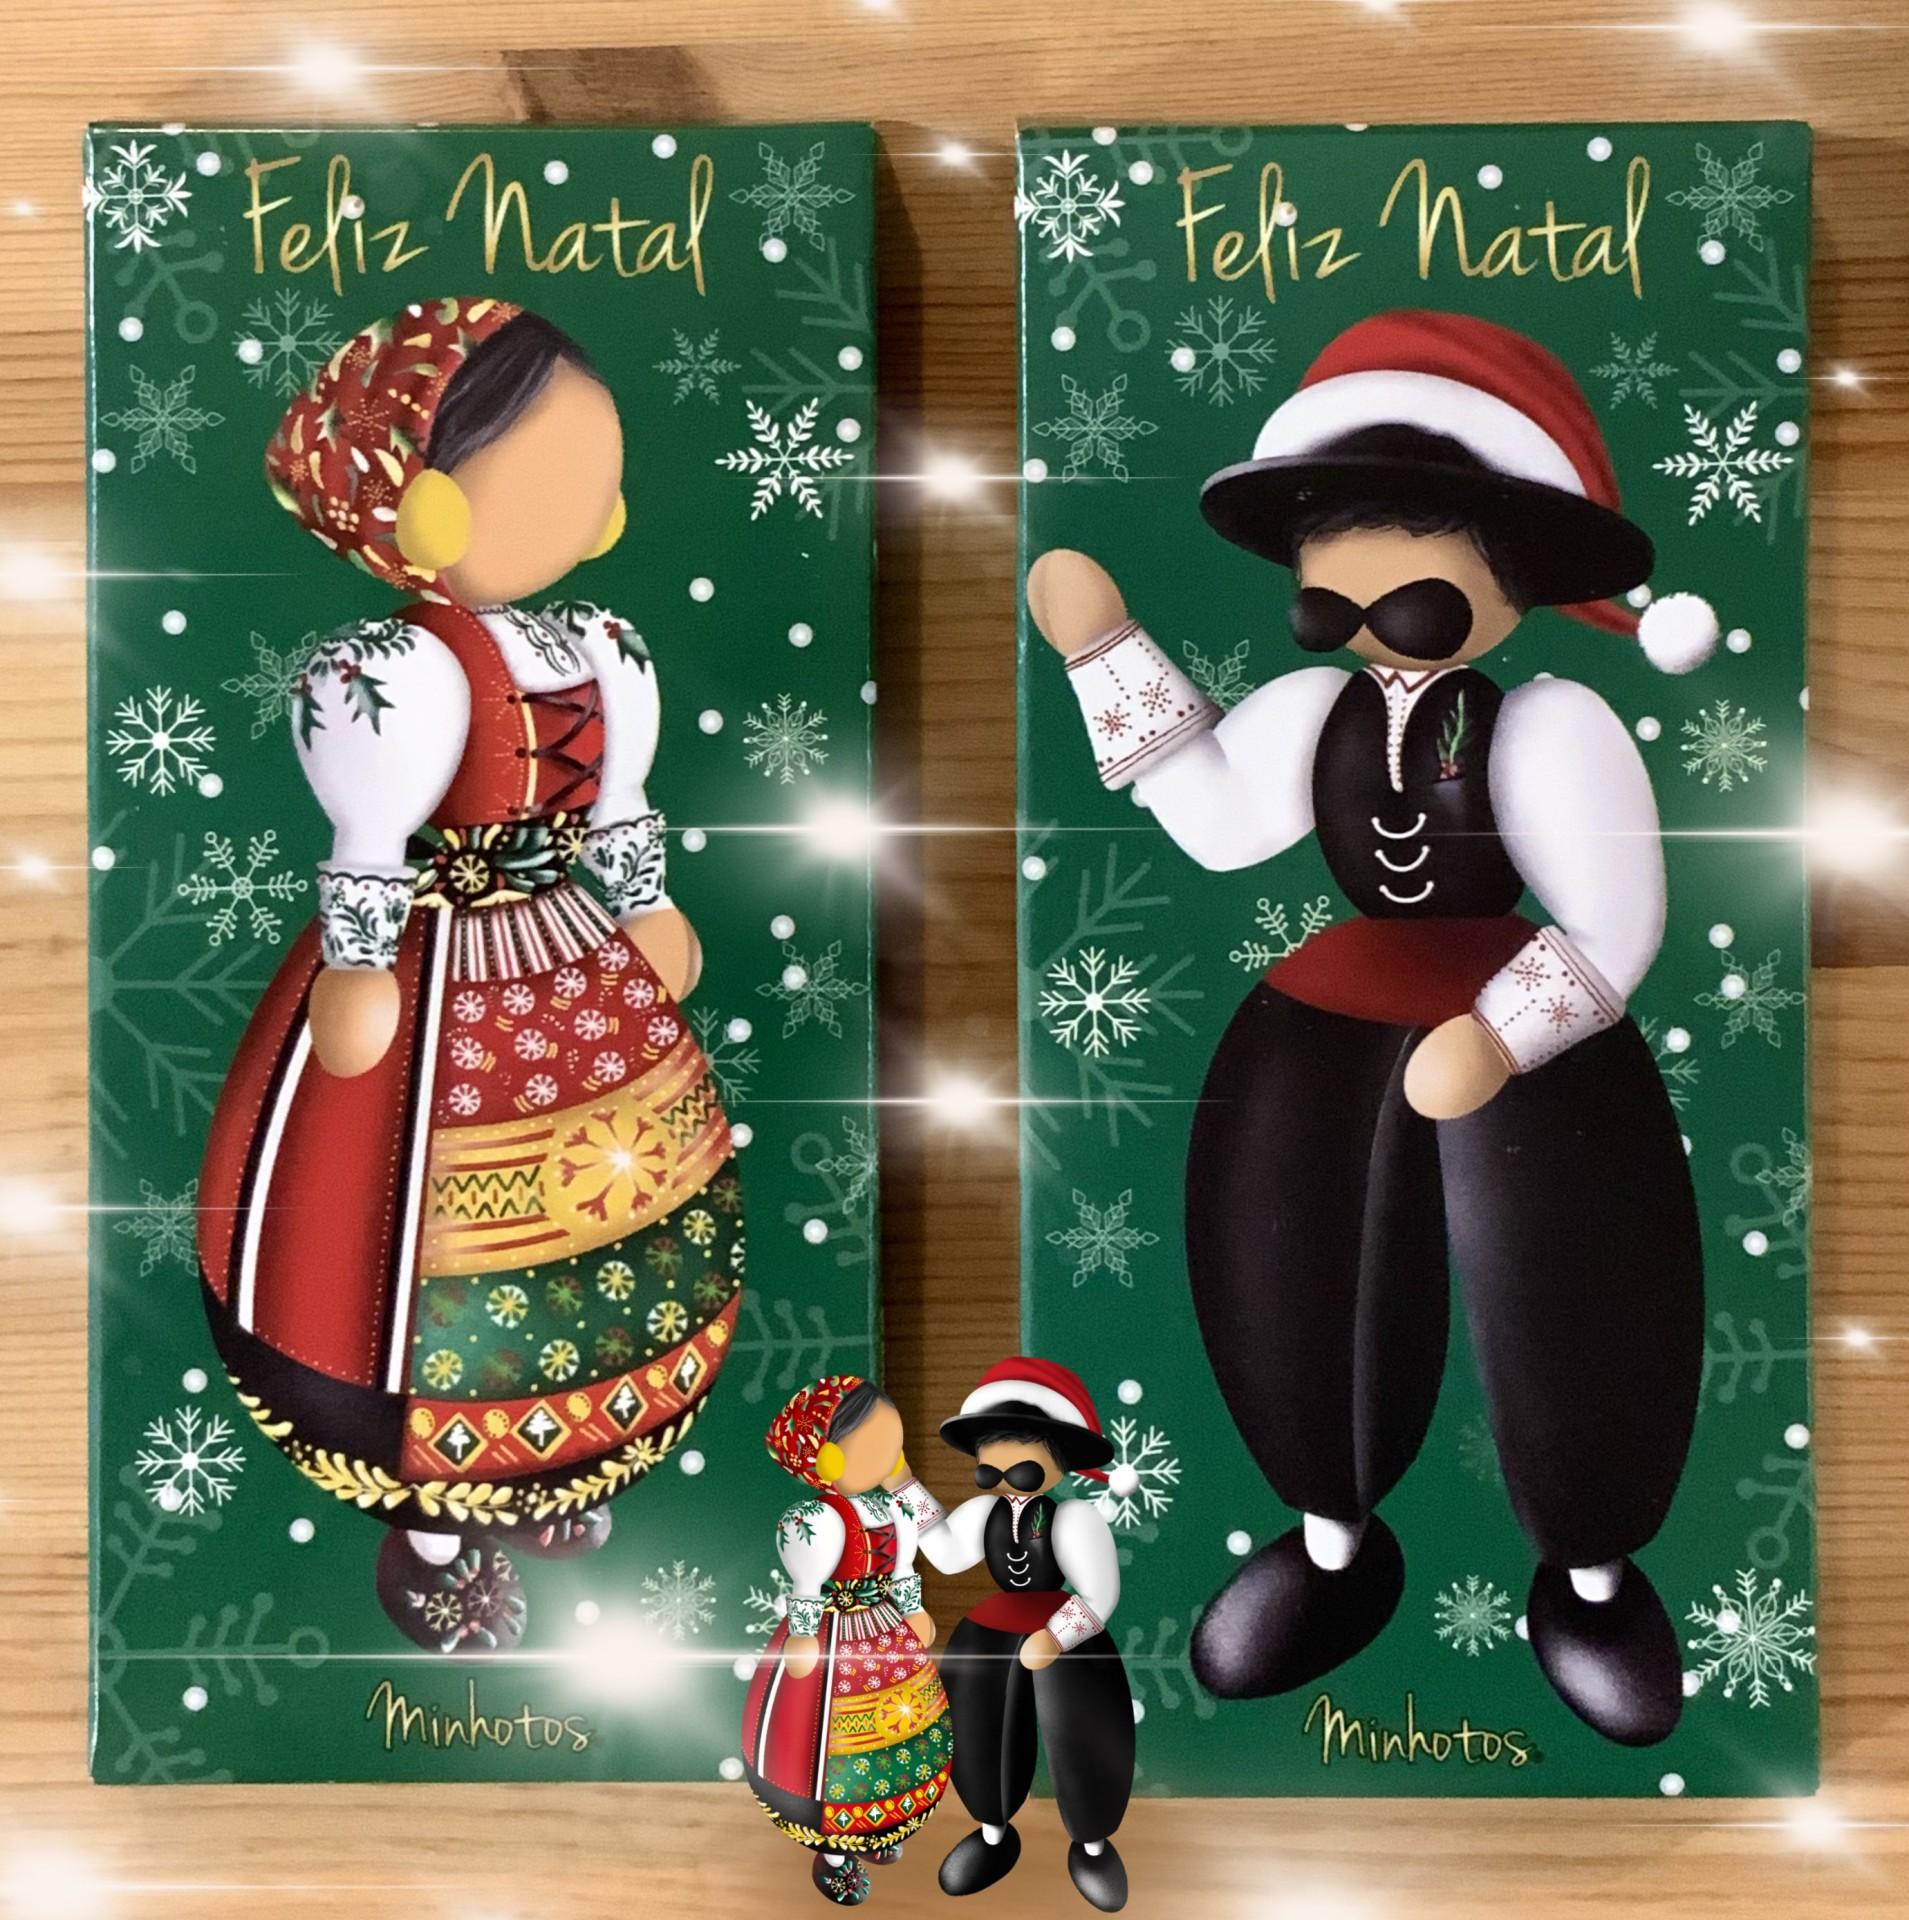 Tabletes de Natal Minhotos